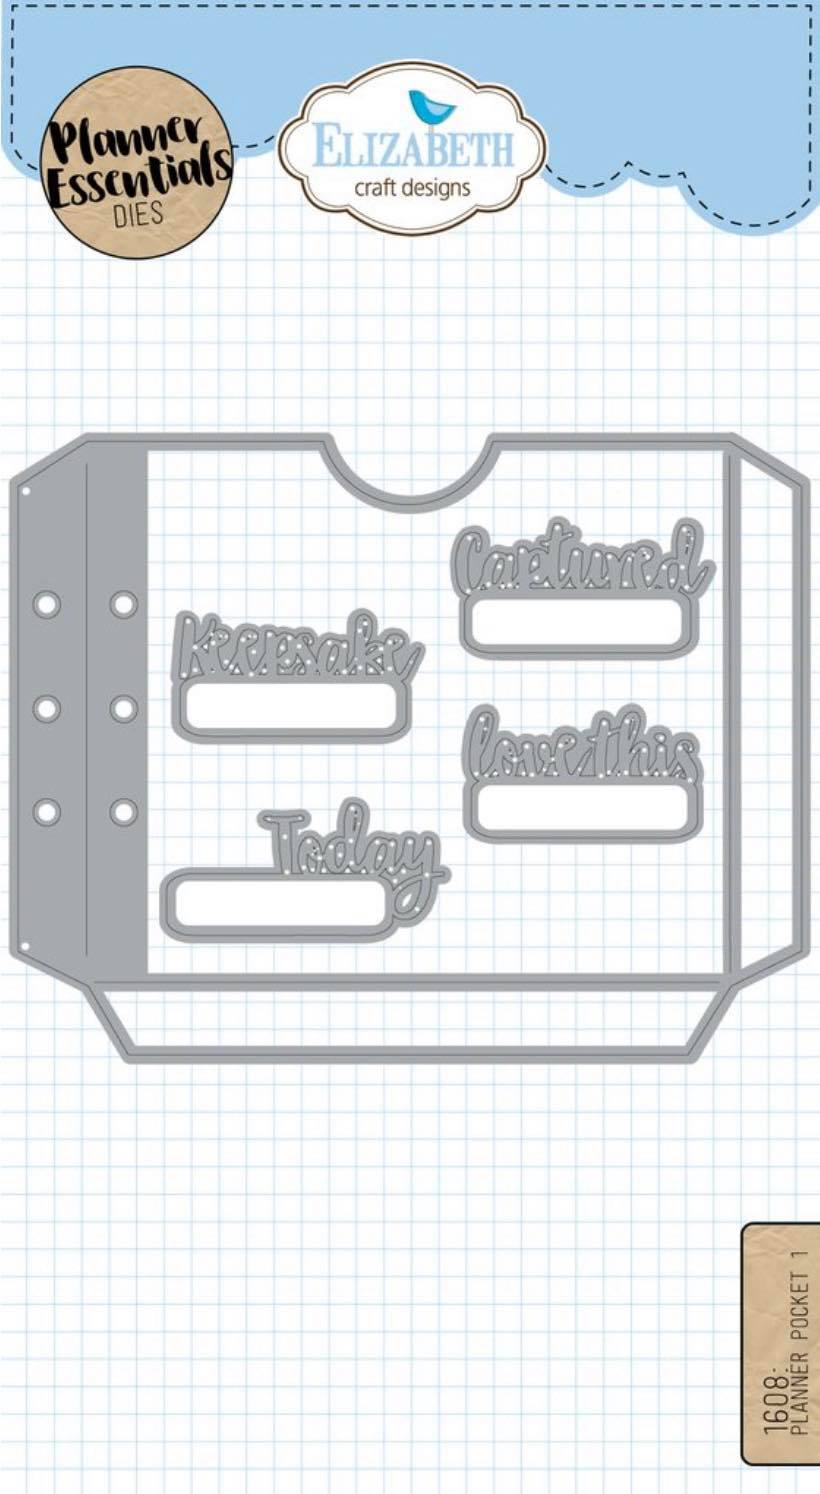 Elizabeth Craft Designs - Planner Pocket 1